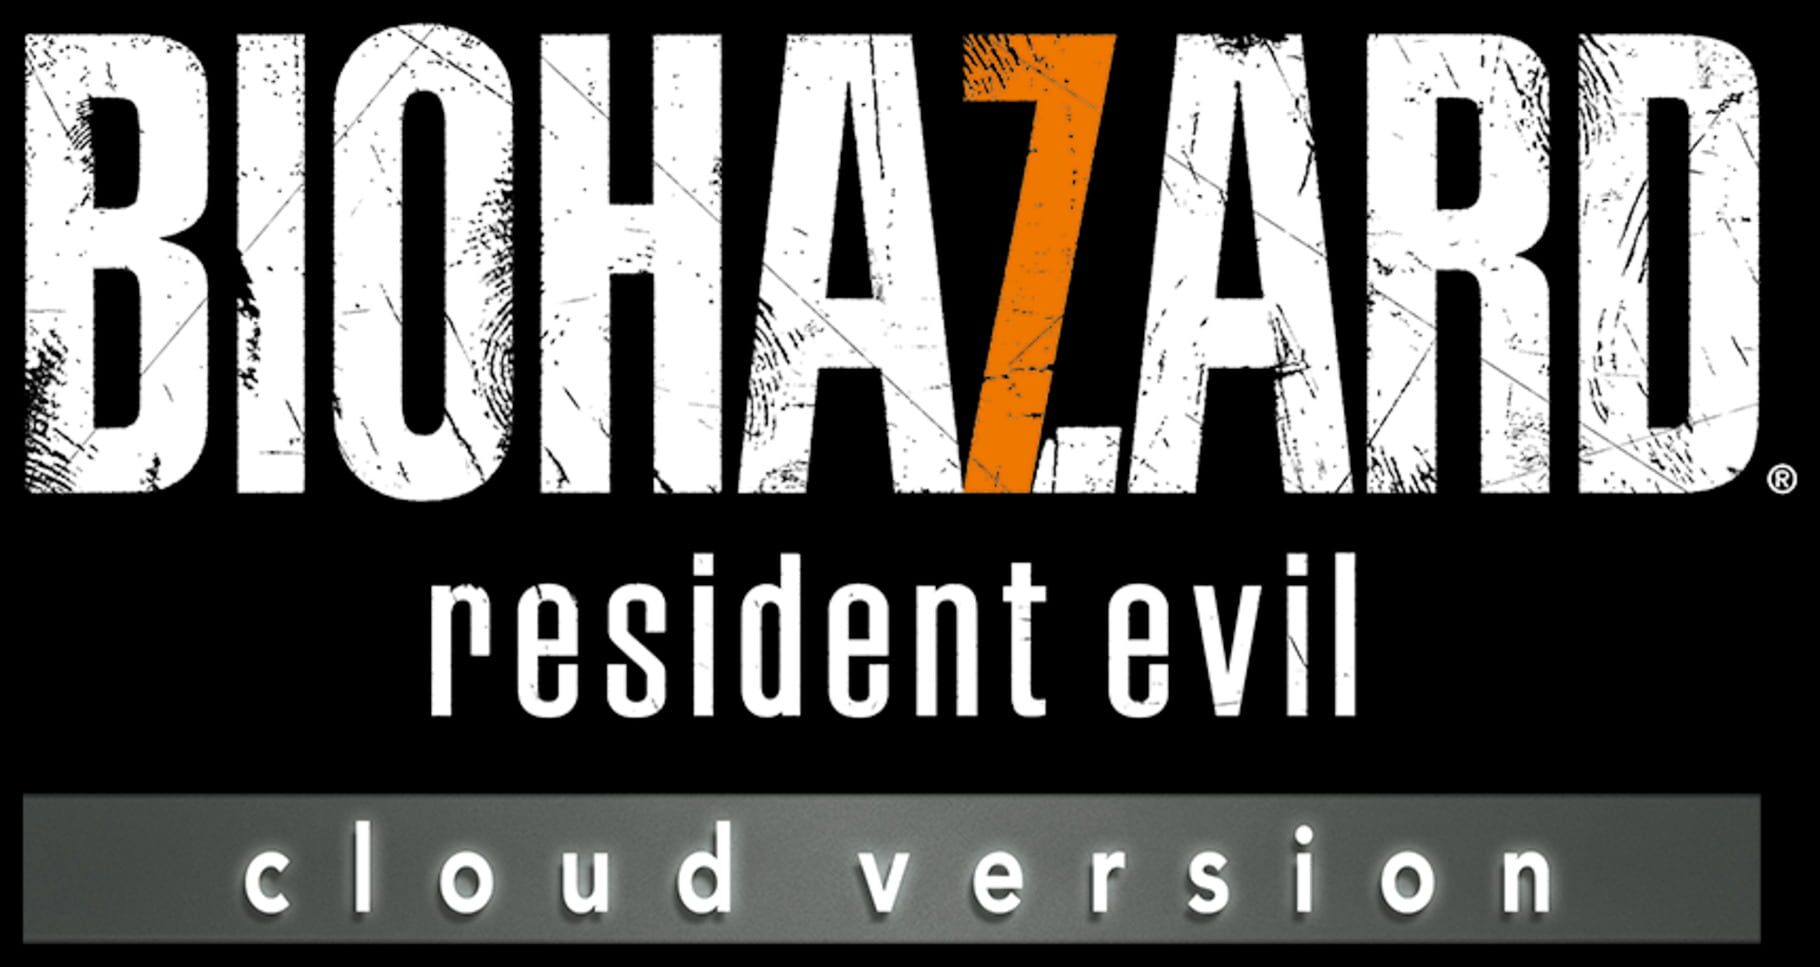 buy Resident Evil 7: Biohazard - Cloud version cd key for all platform